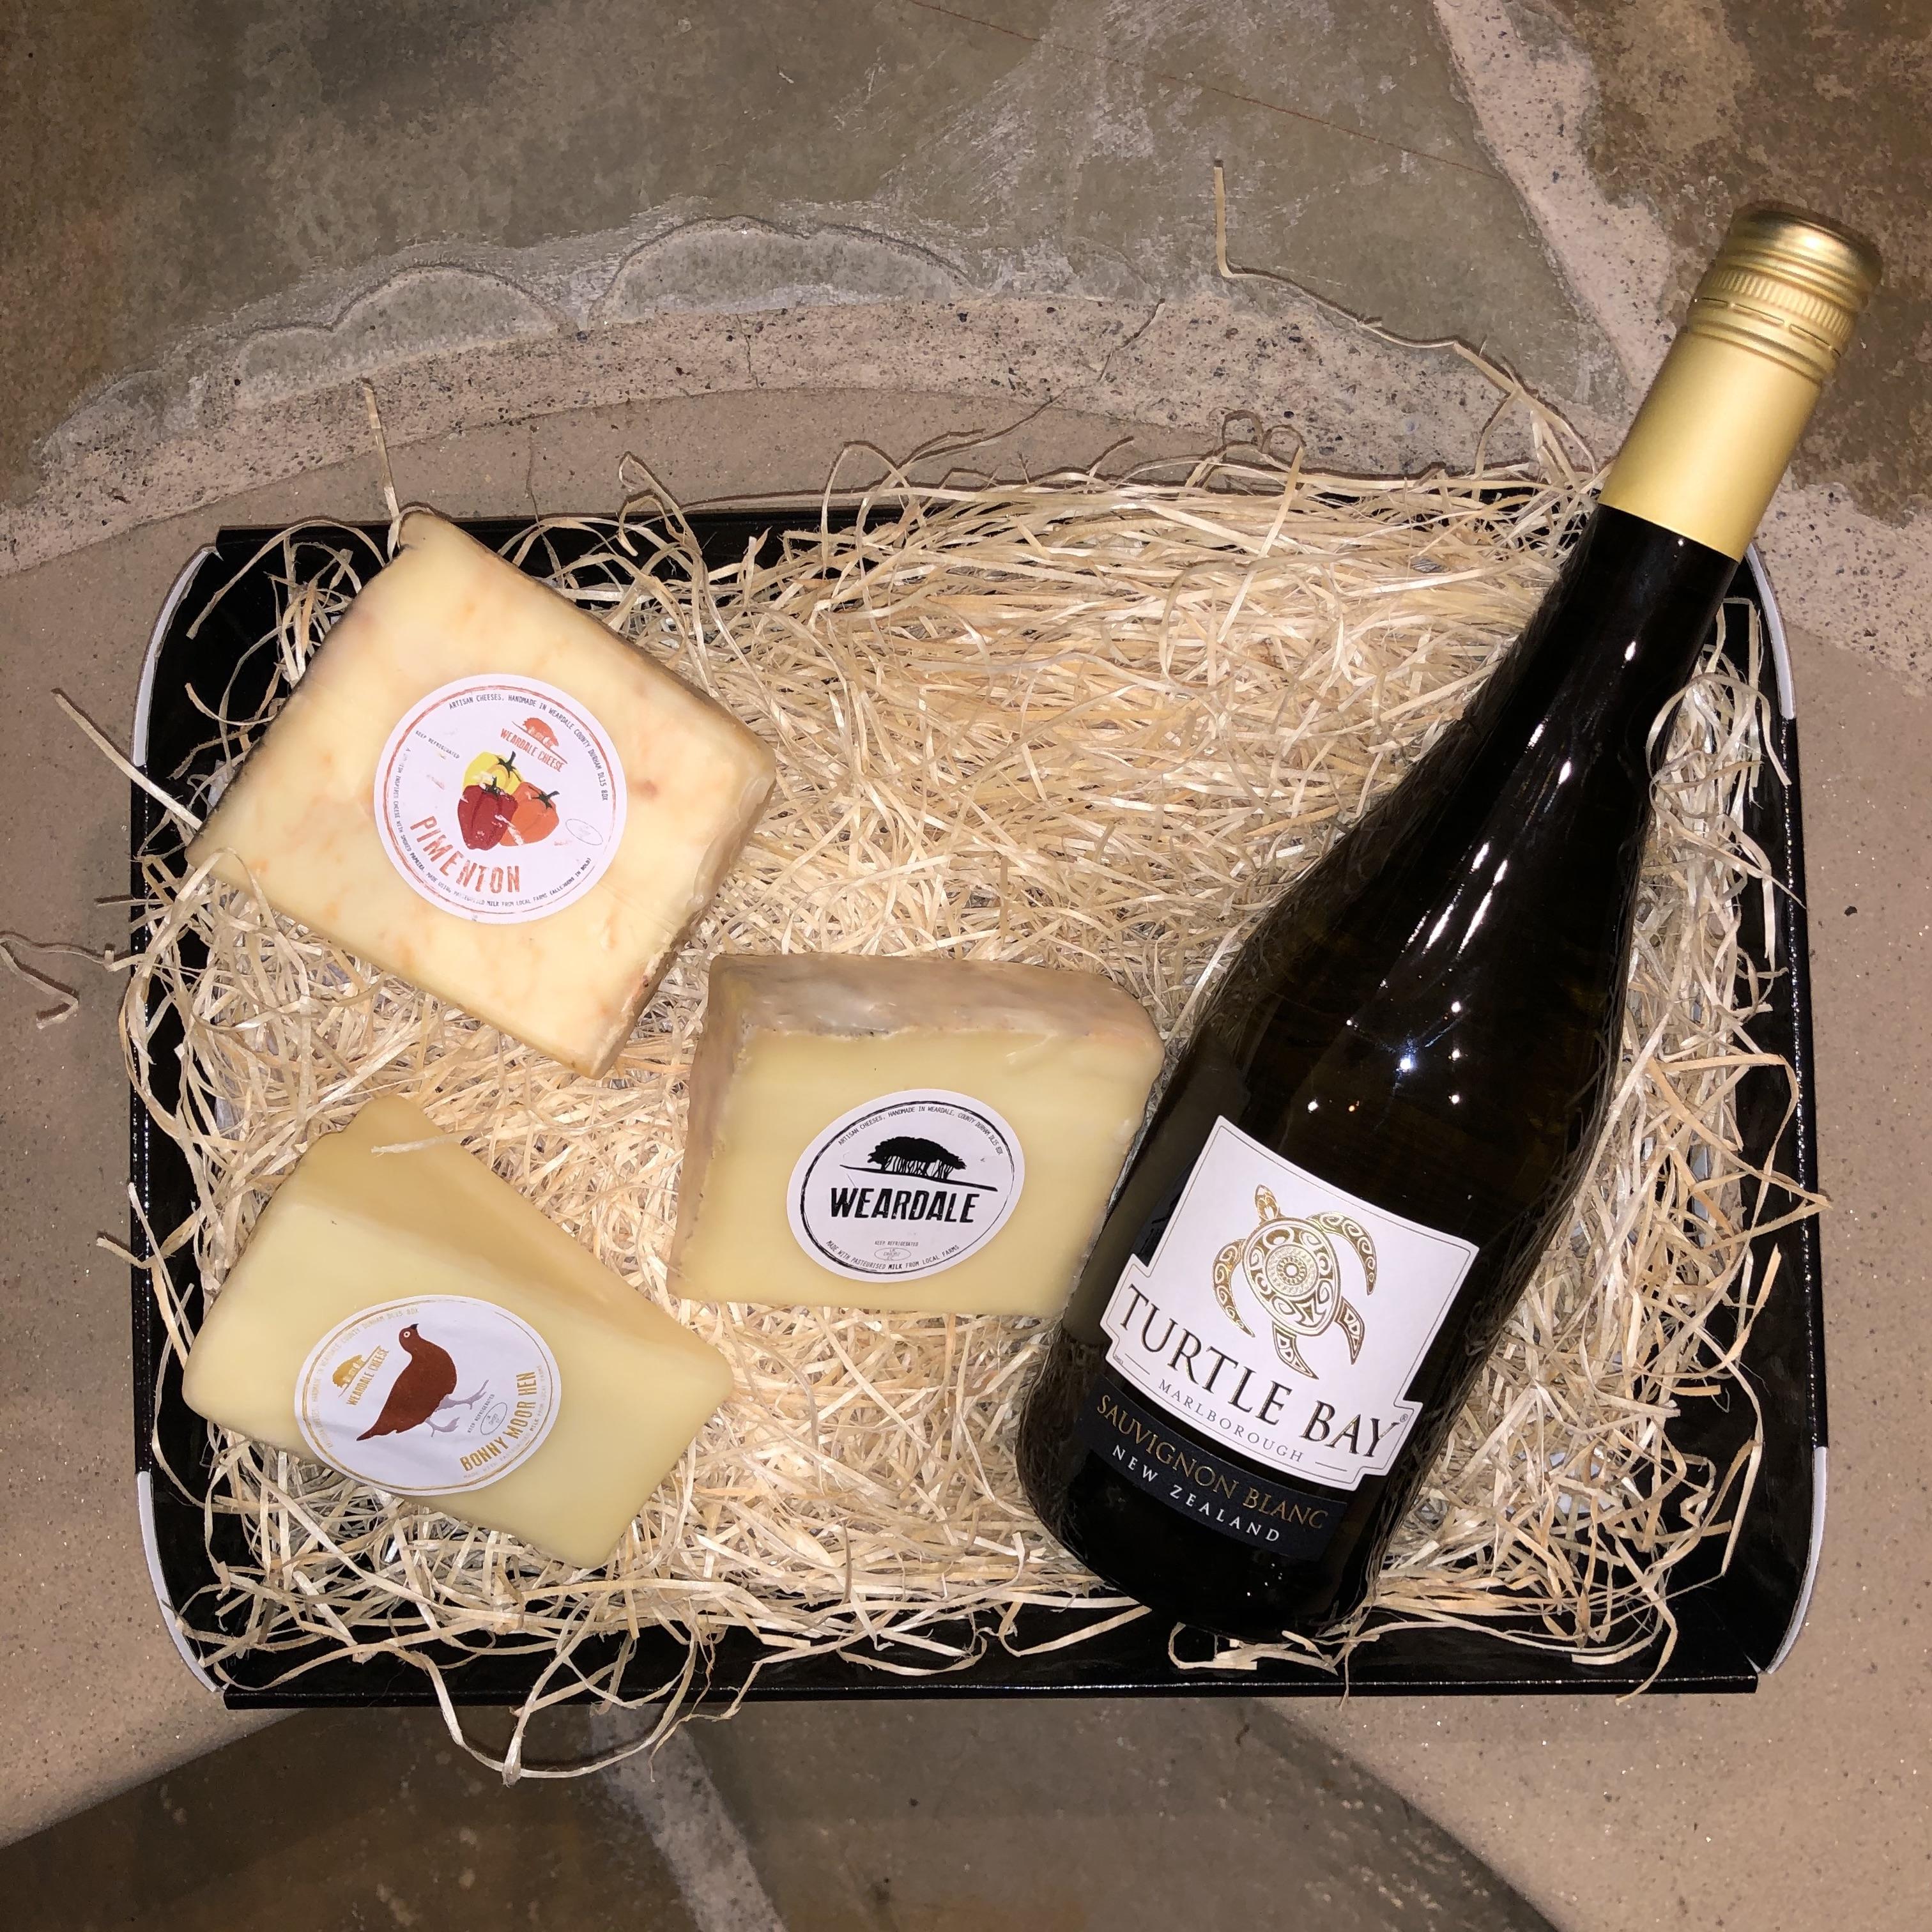 Clarks Hamper - White Wine & Cheese